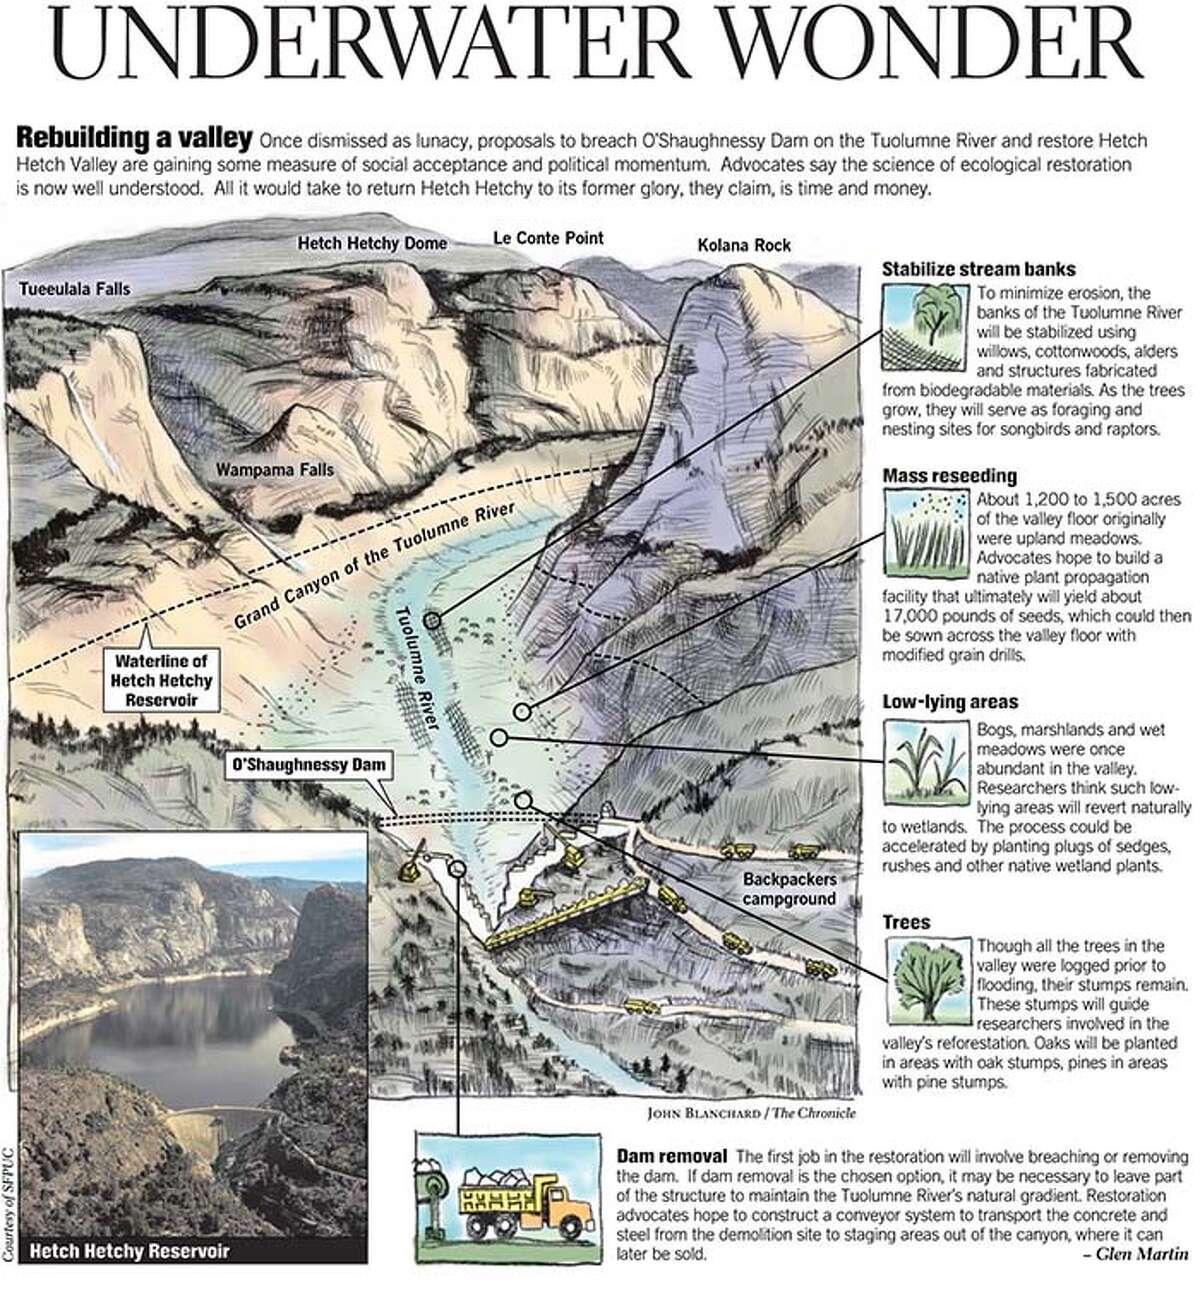 Underwater Wonder. Chronicle graphic by John Blanchard